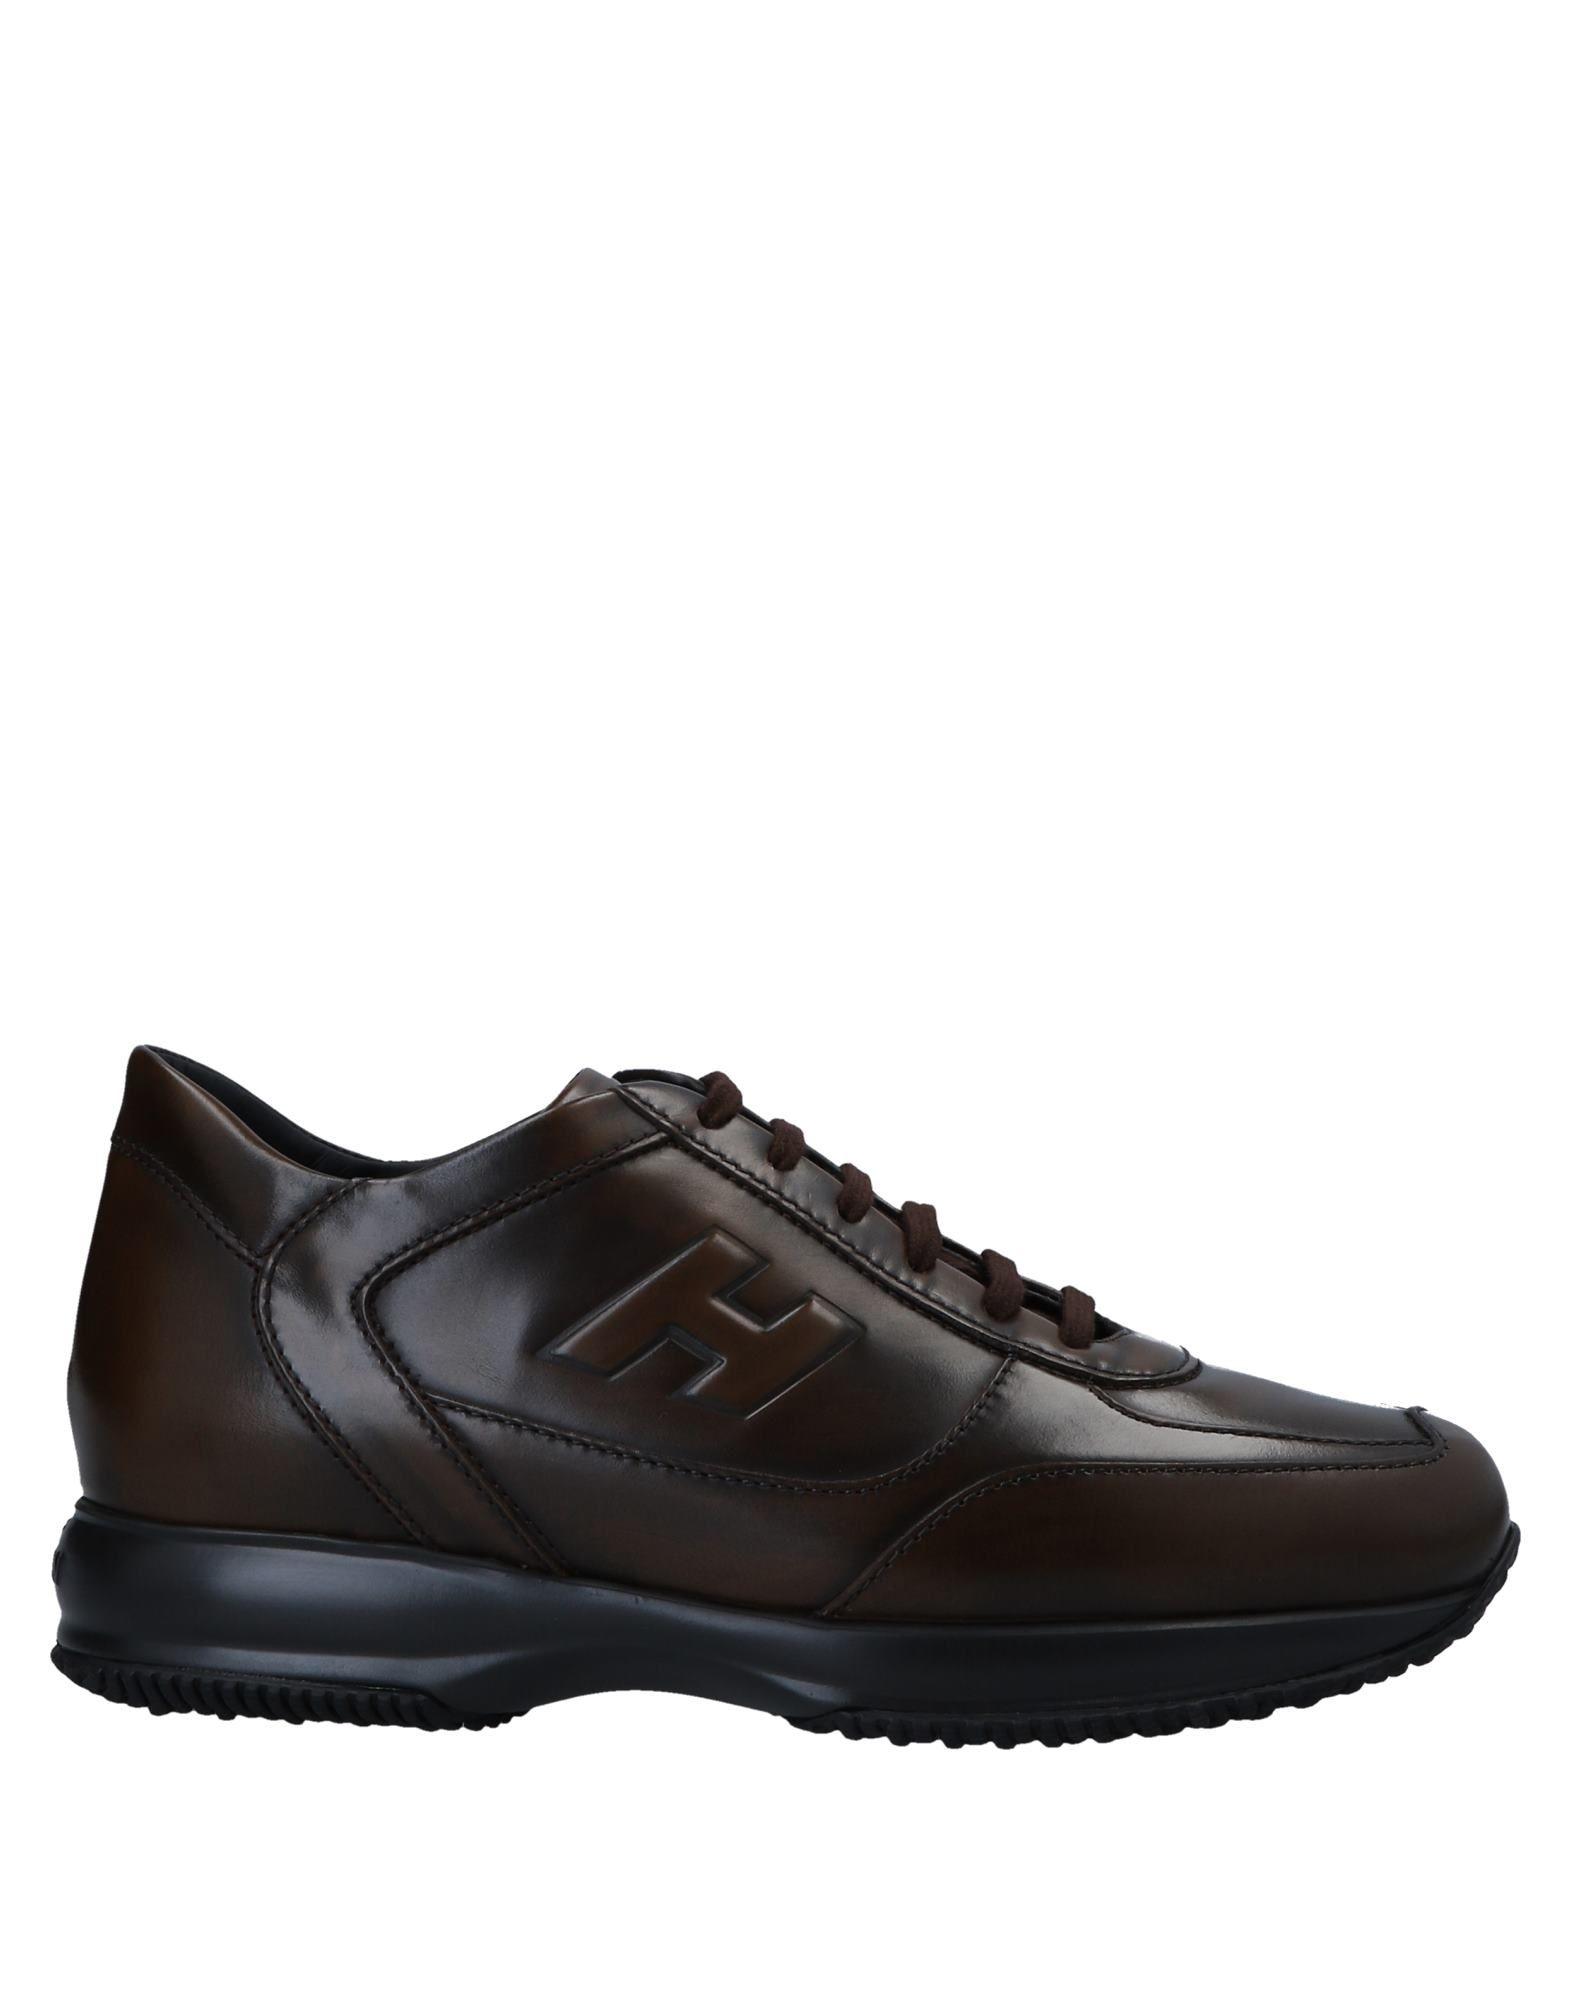 Hogan Sneakers Herren  11556123NI Gute Qualität beliebte Schuhe